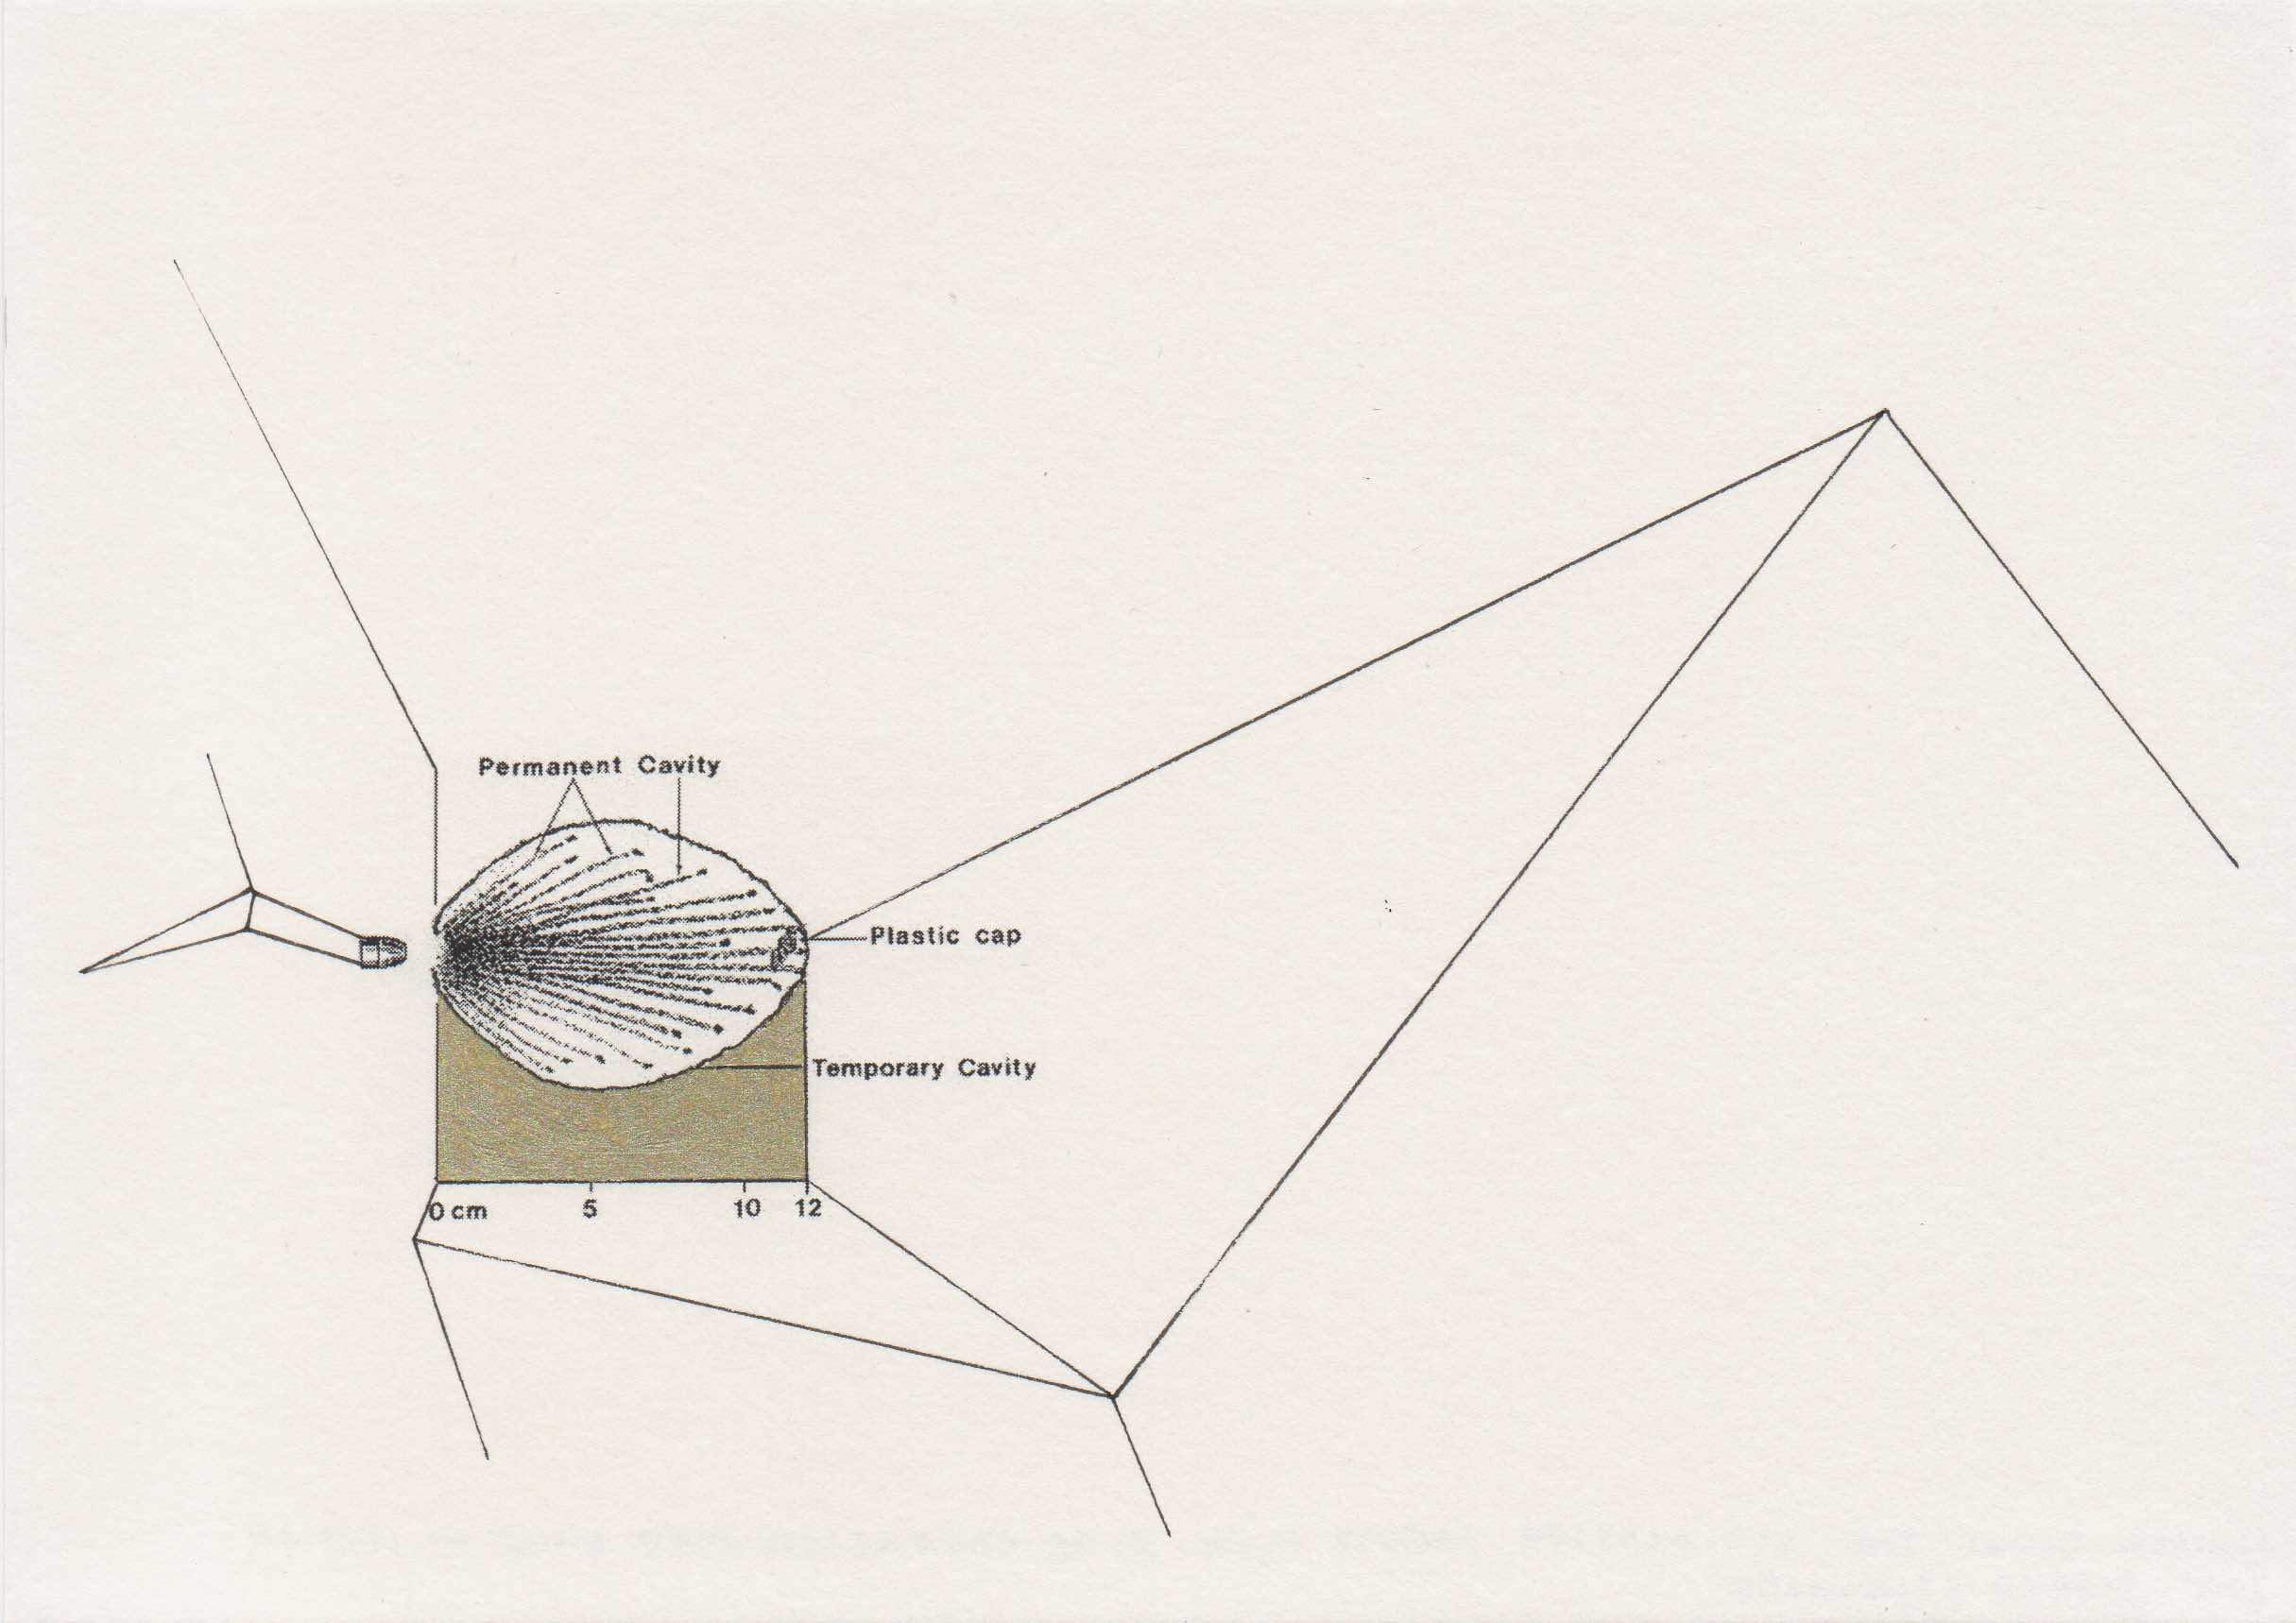 Joanna Rajkowska .357 Glasser Safety Slug, 80gr Prefragmented Bullet at 1785 f:s 2015 20.6x14.6 cm.jpg